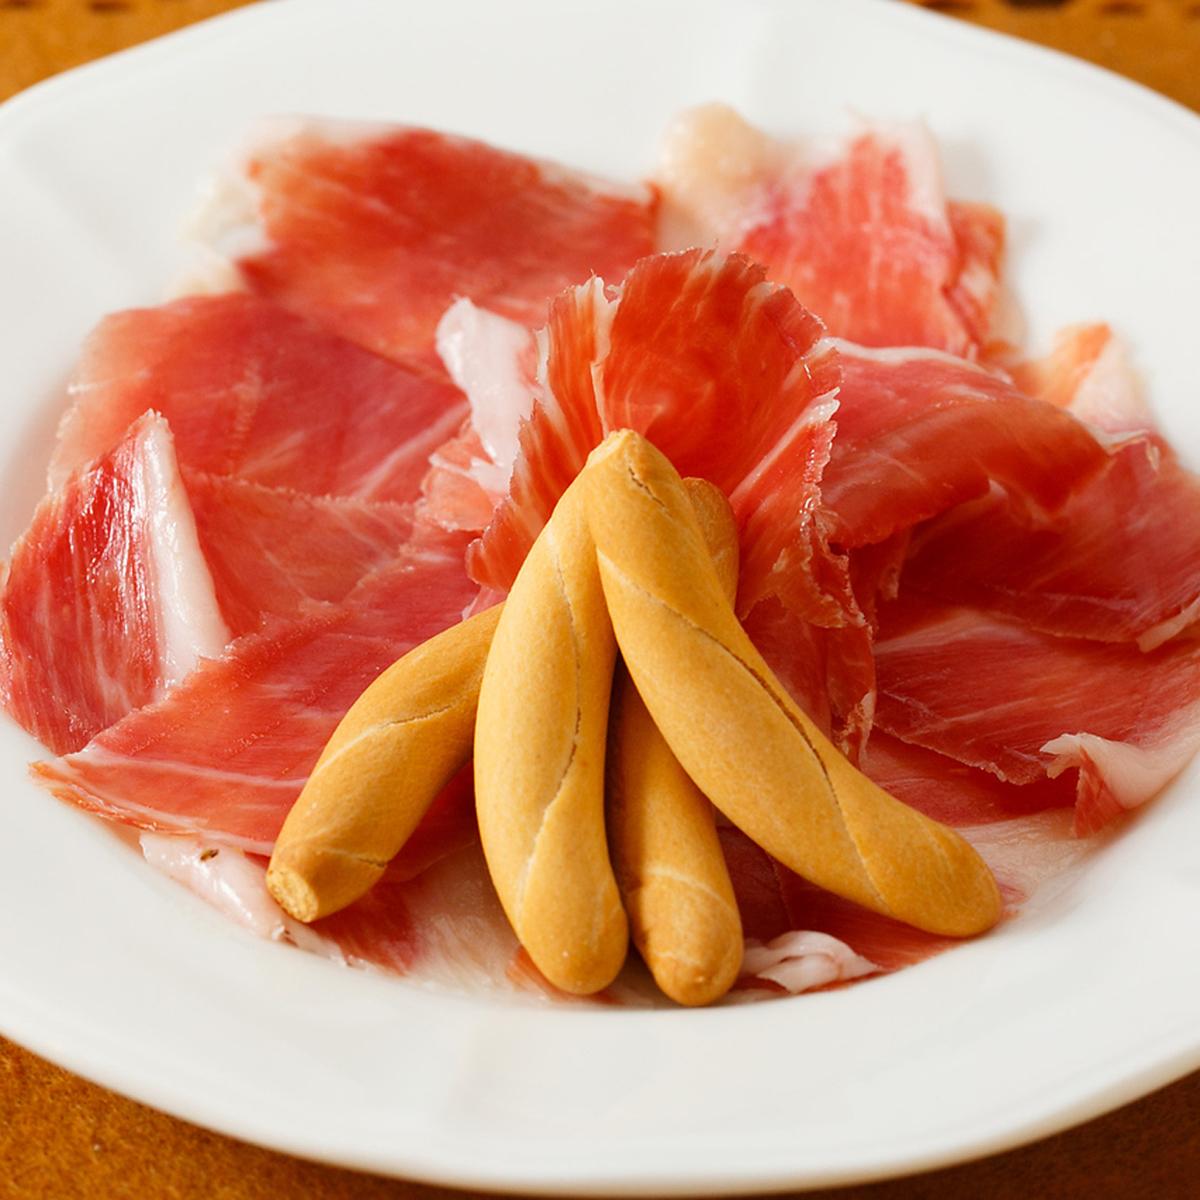 Spanish-made ham